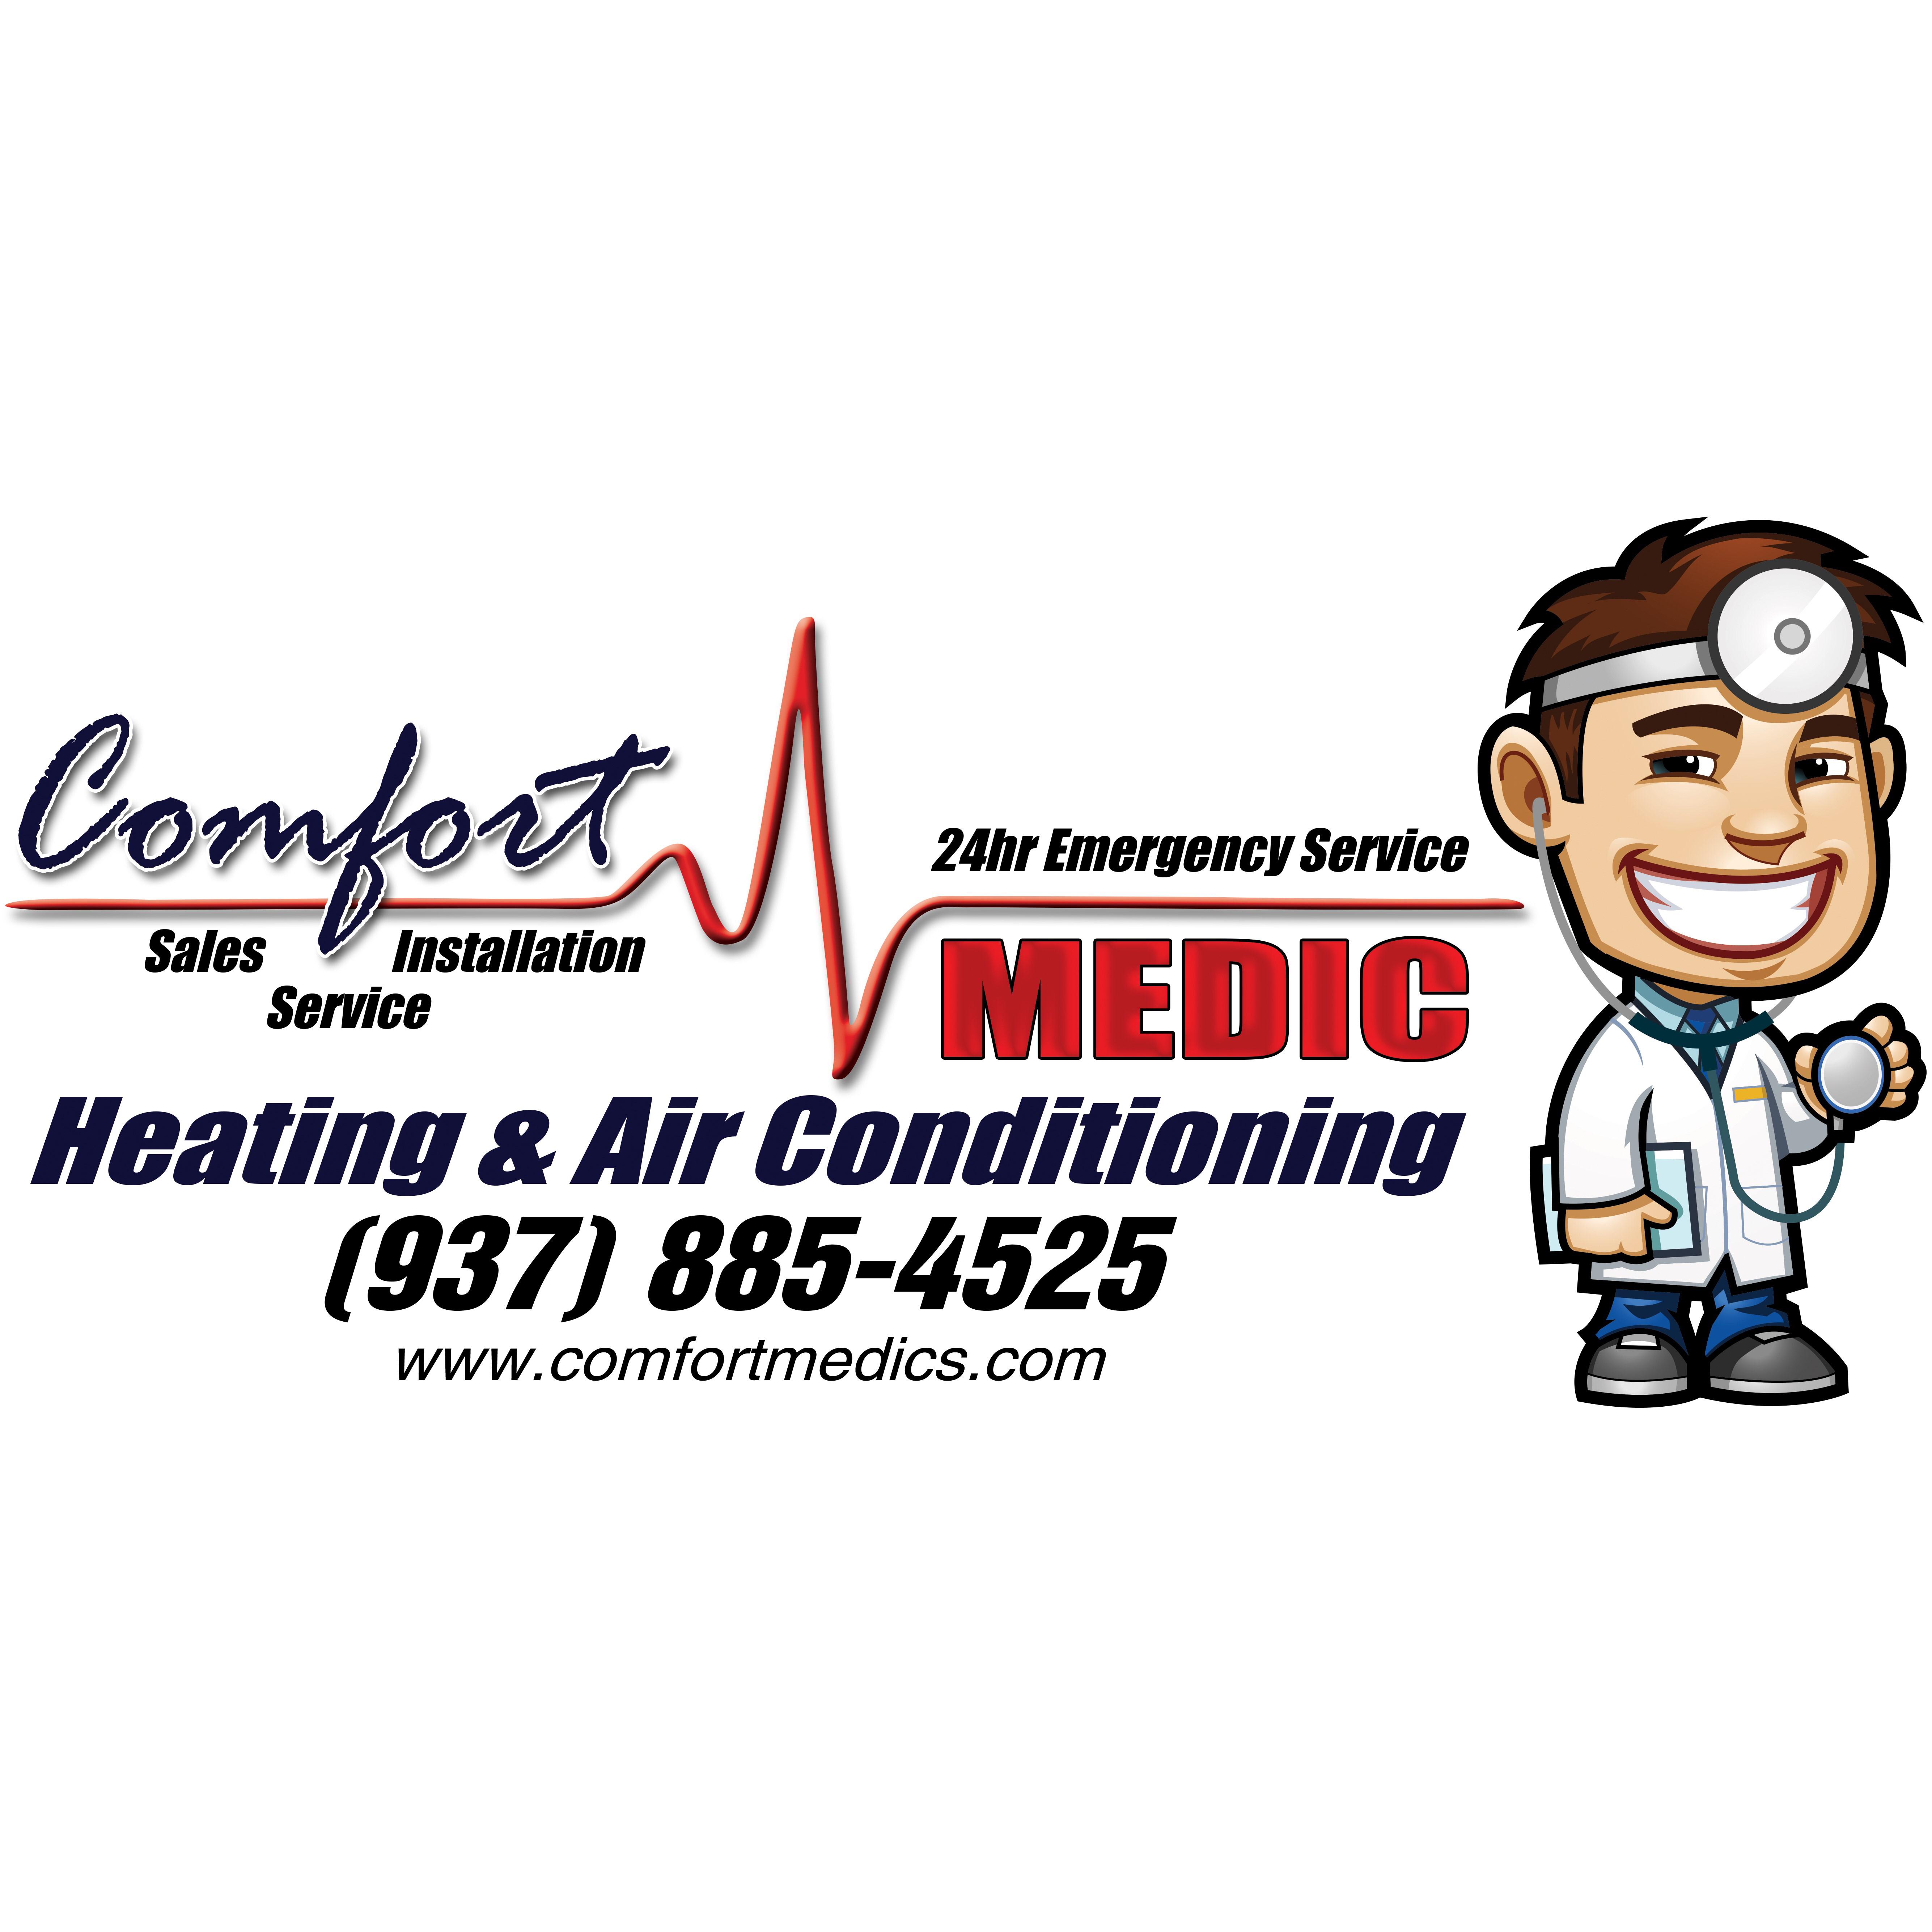 Comfort MEDIC Heating & Air Conditioning - Dayton, OH - Heating & Air Conditioning